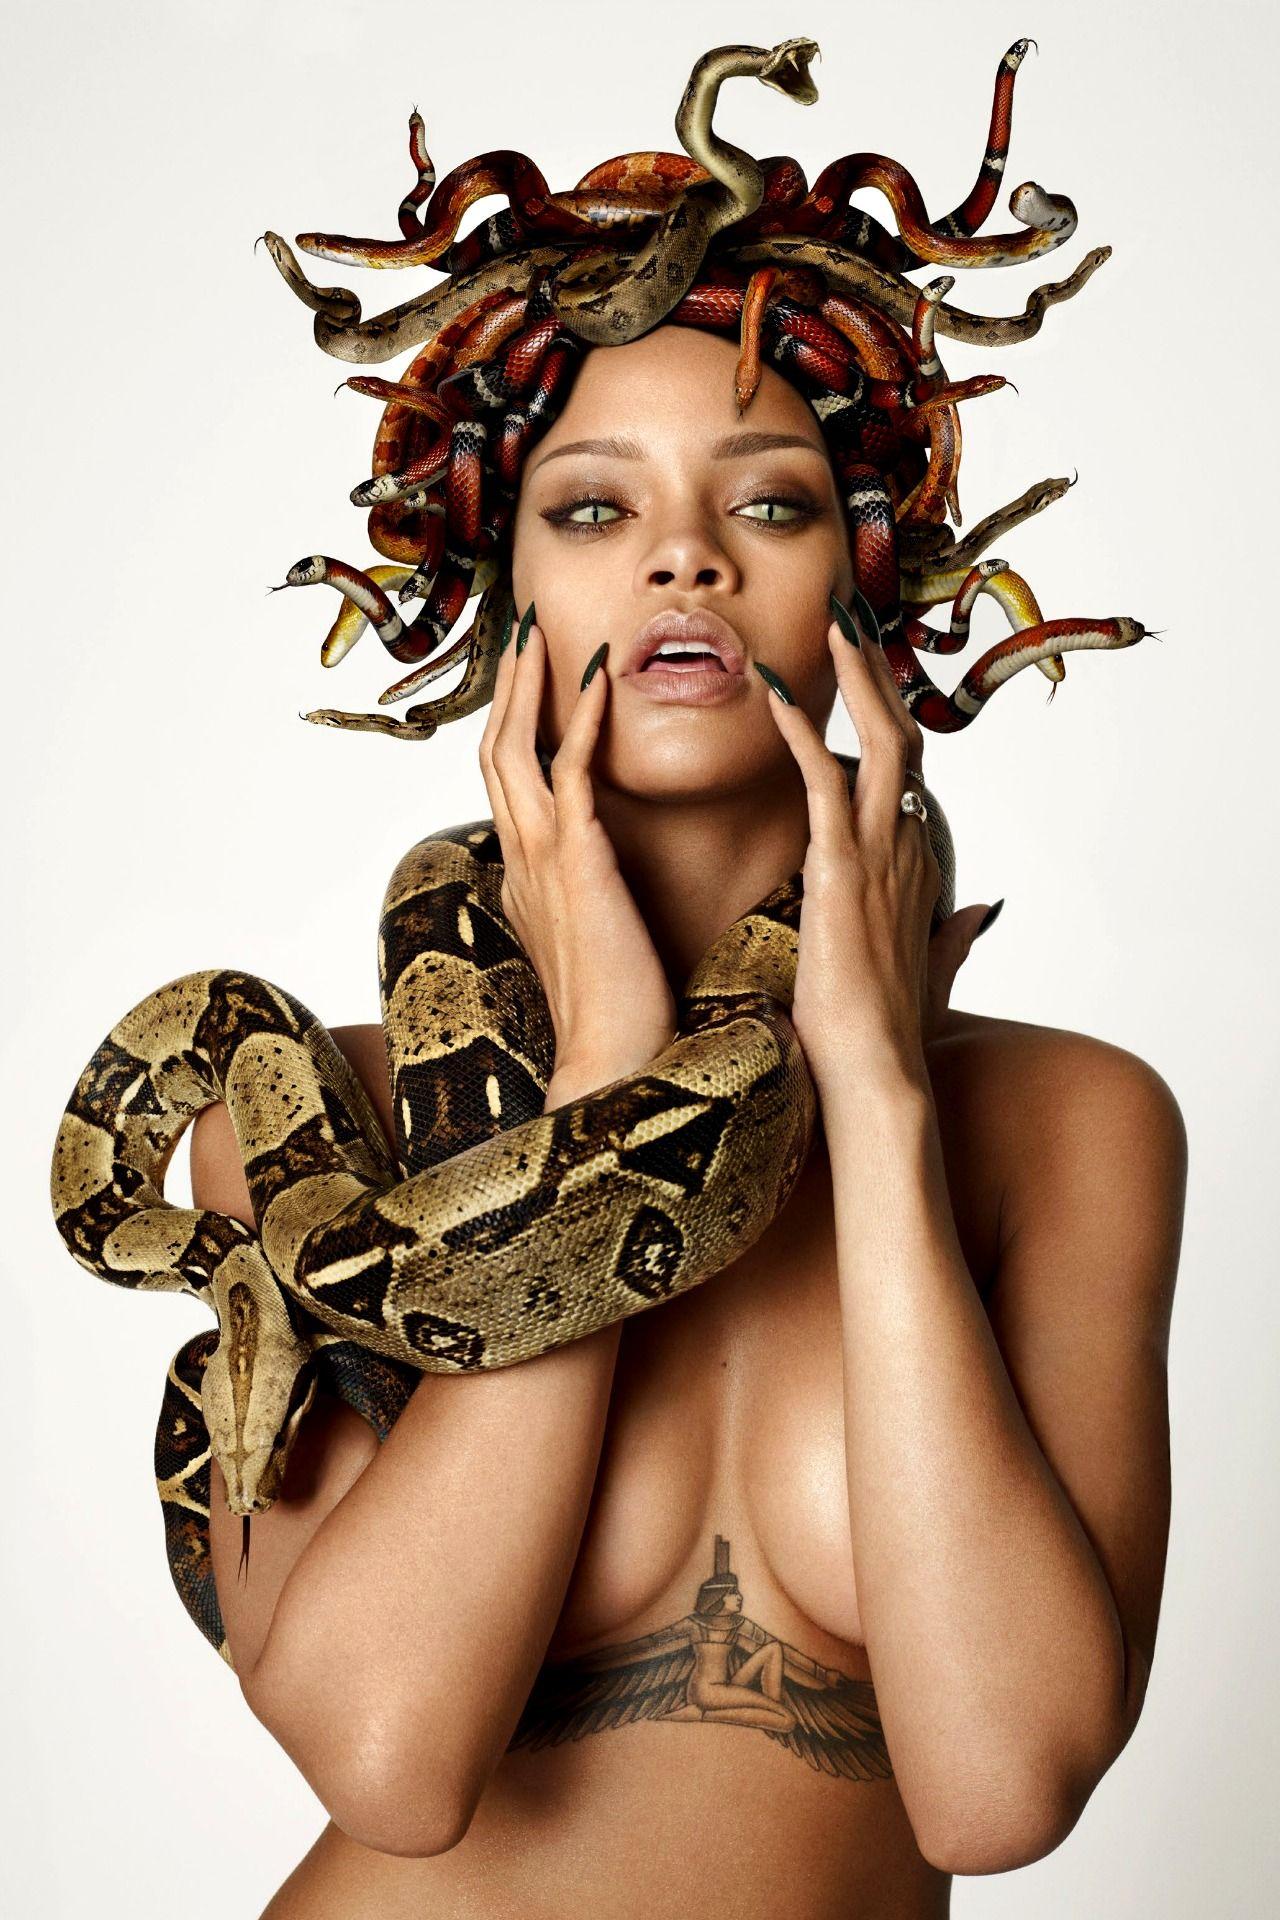 Reptilian Rihanna Poses as Monstrous Medusa for GQ